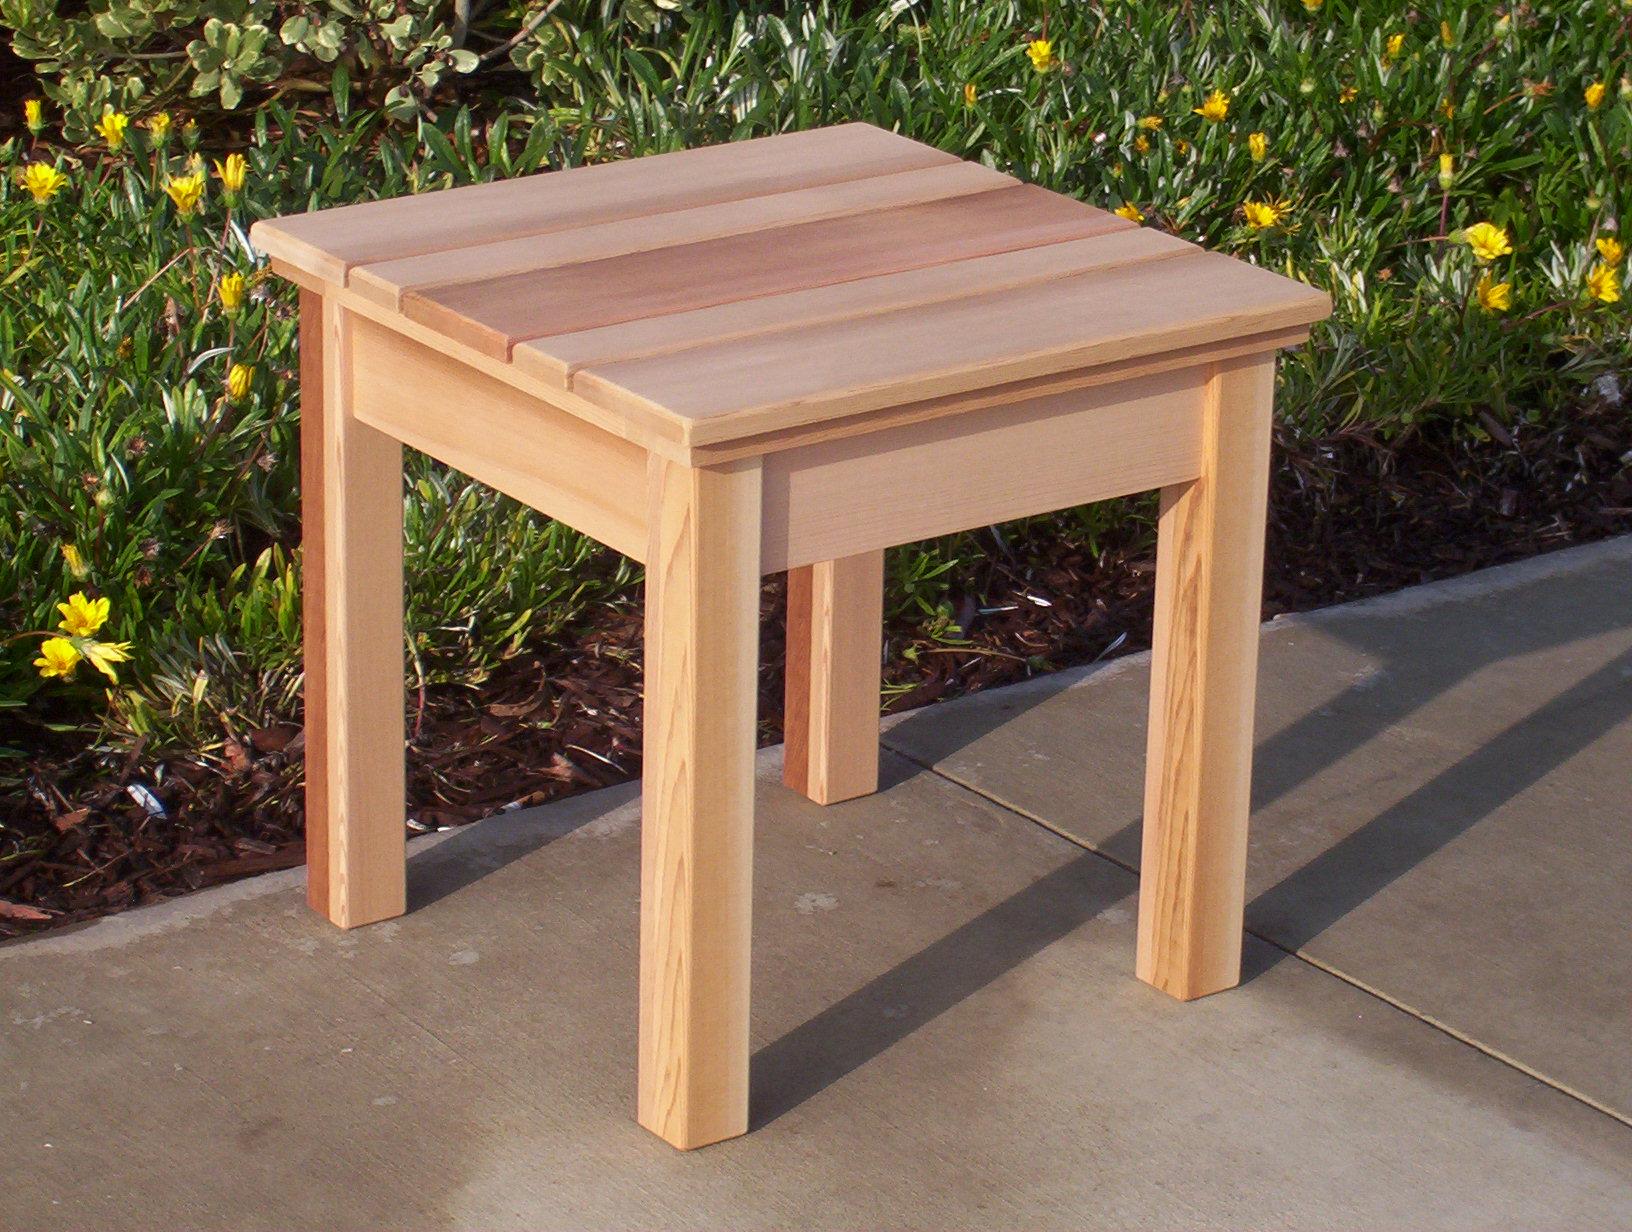 Endtable for Short end table